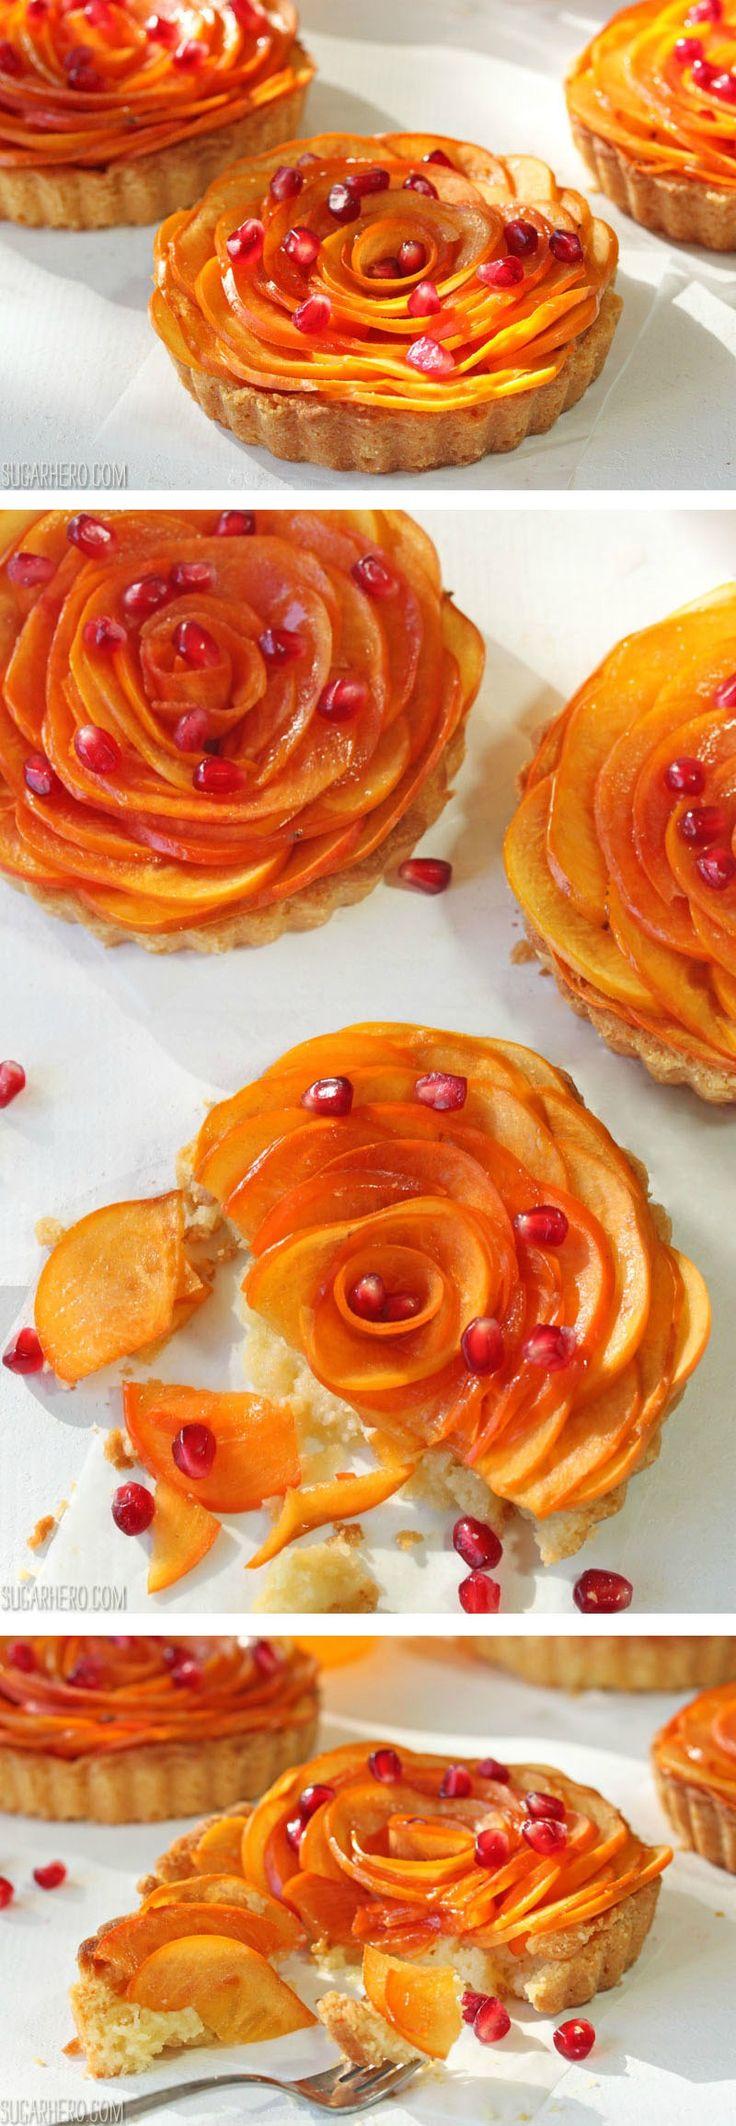 Persimmon Almond Rosette Tarts - a gorgeous fall dessert!   From SugarHero.com